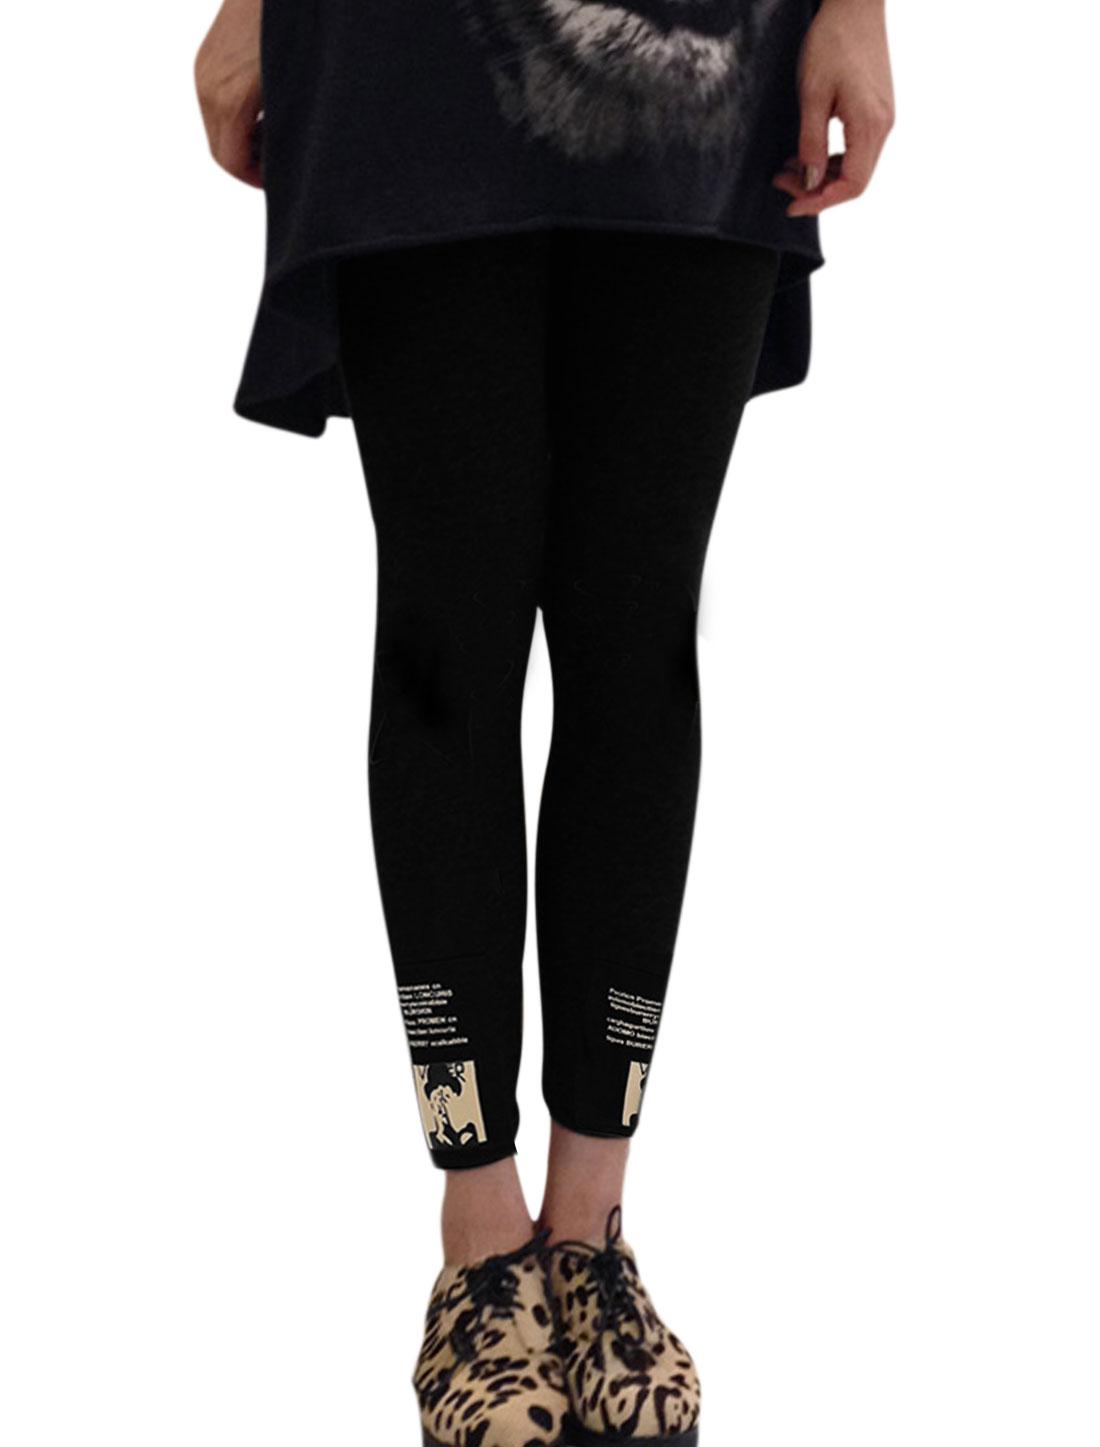 Women Portrait Prints Cuffs Elastic Waist Leggings Black XS